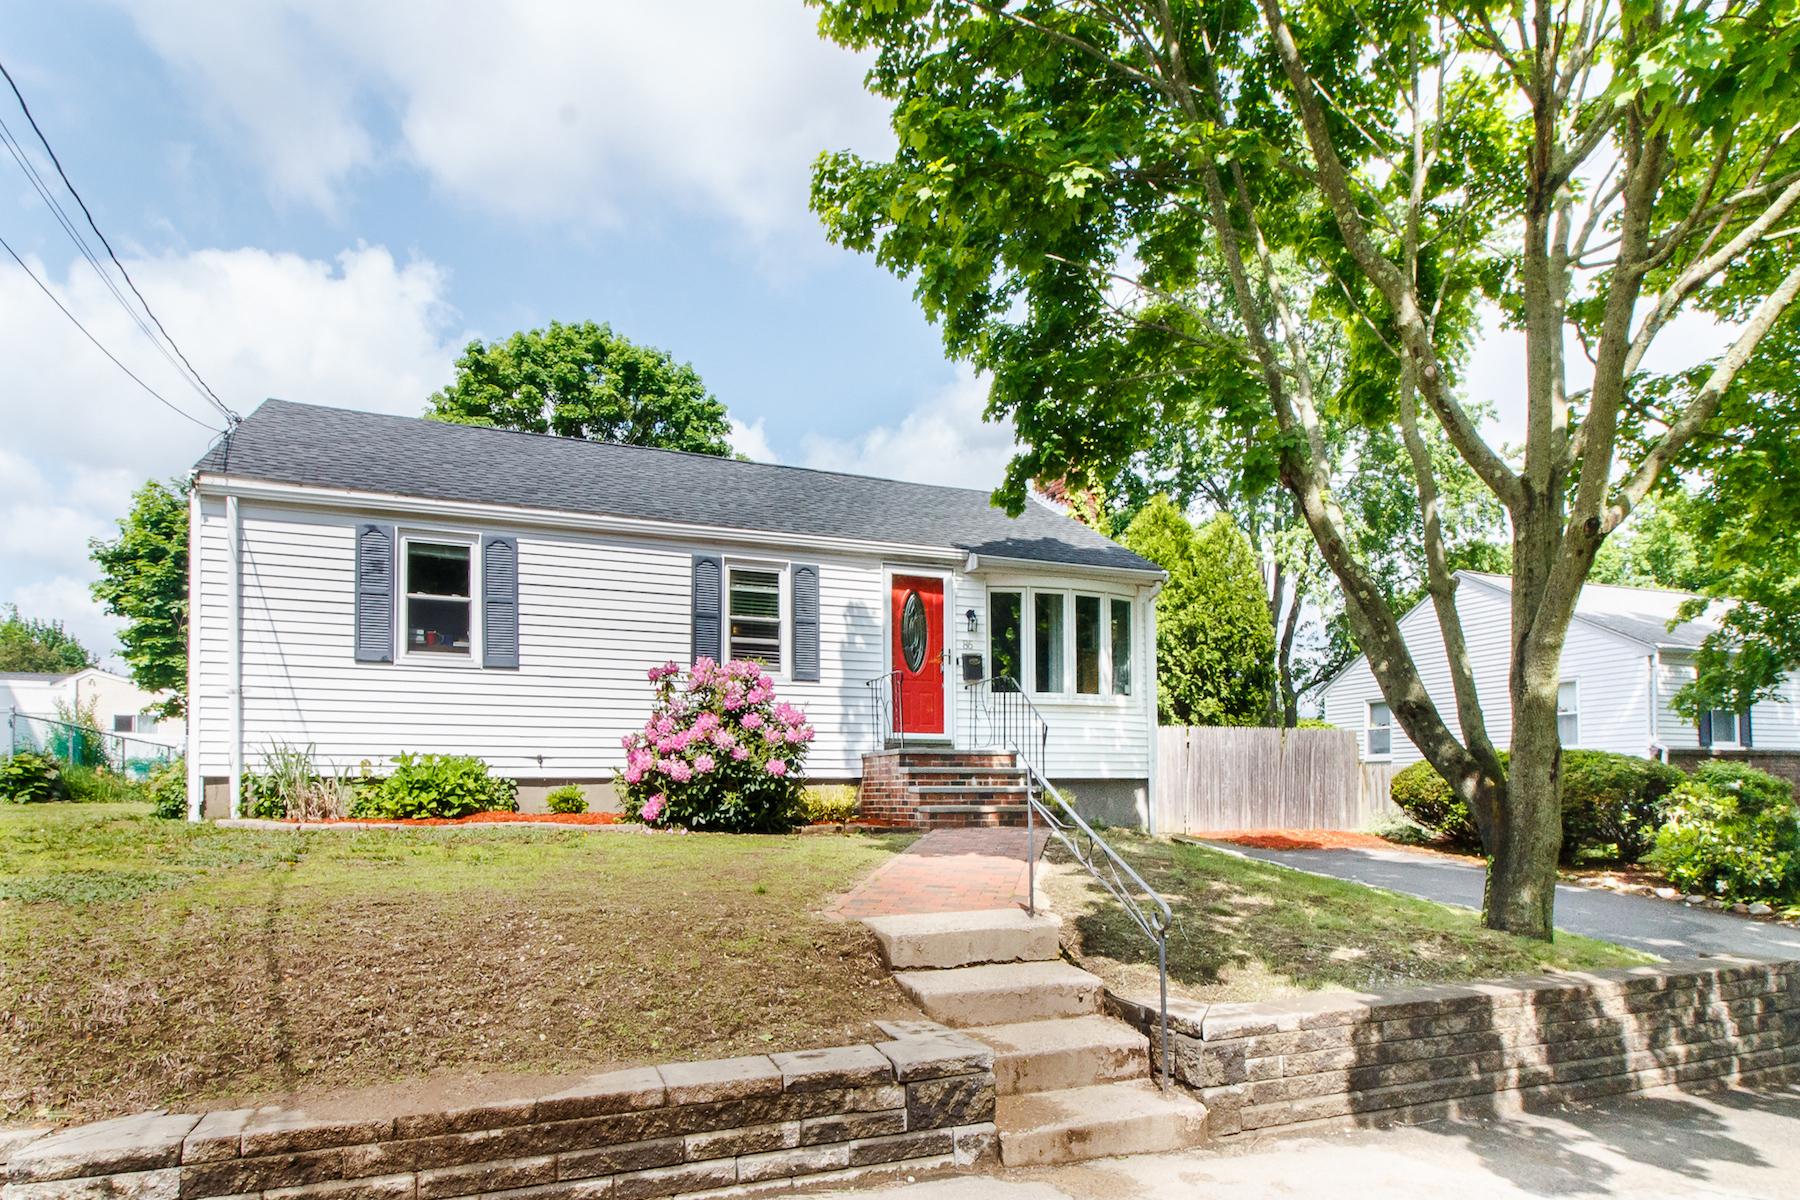 Single Family Homes for Active at 86 Livoli Avenue Braintree, Massachusetts 02184 United States